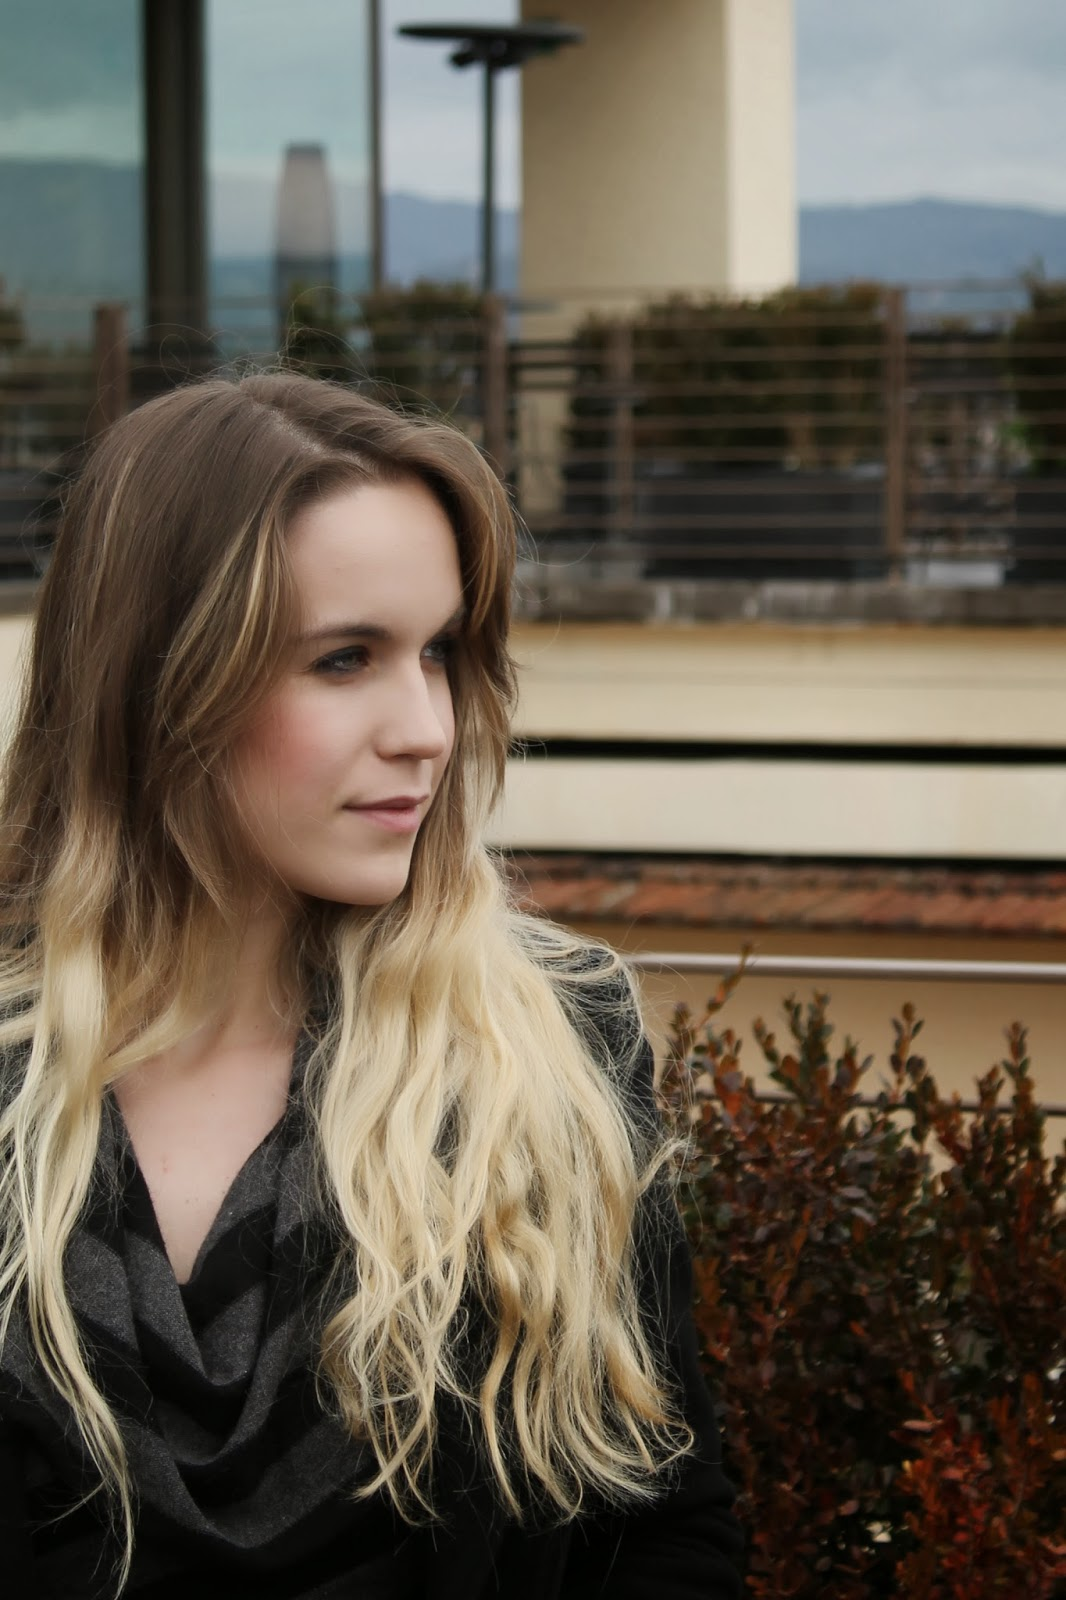 ombre hair, blogger bionda, florence fashion blogger